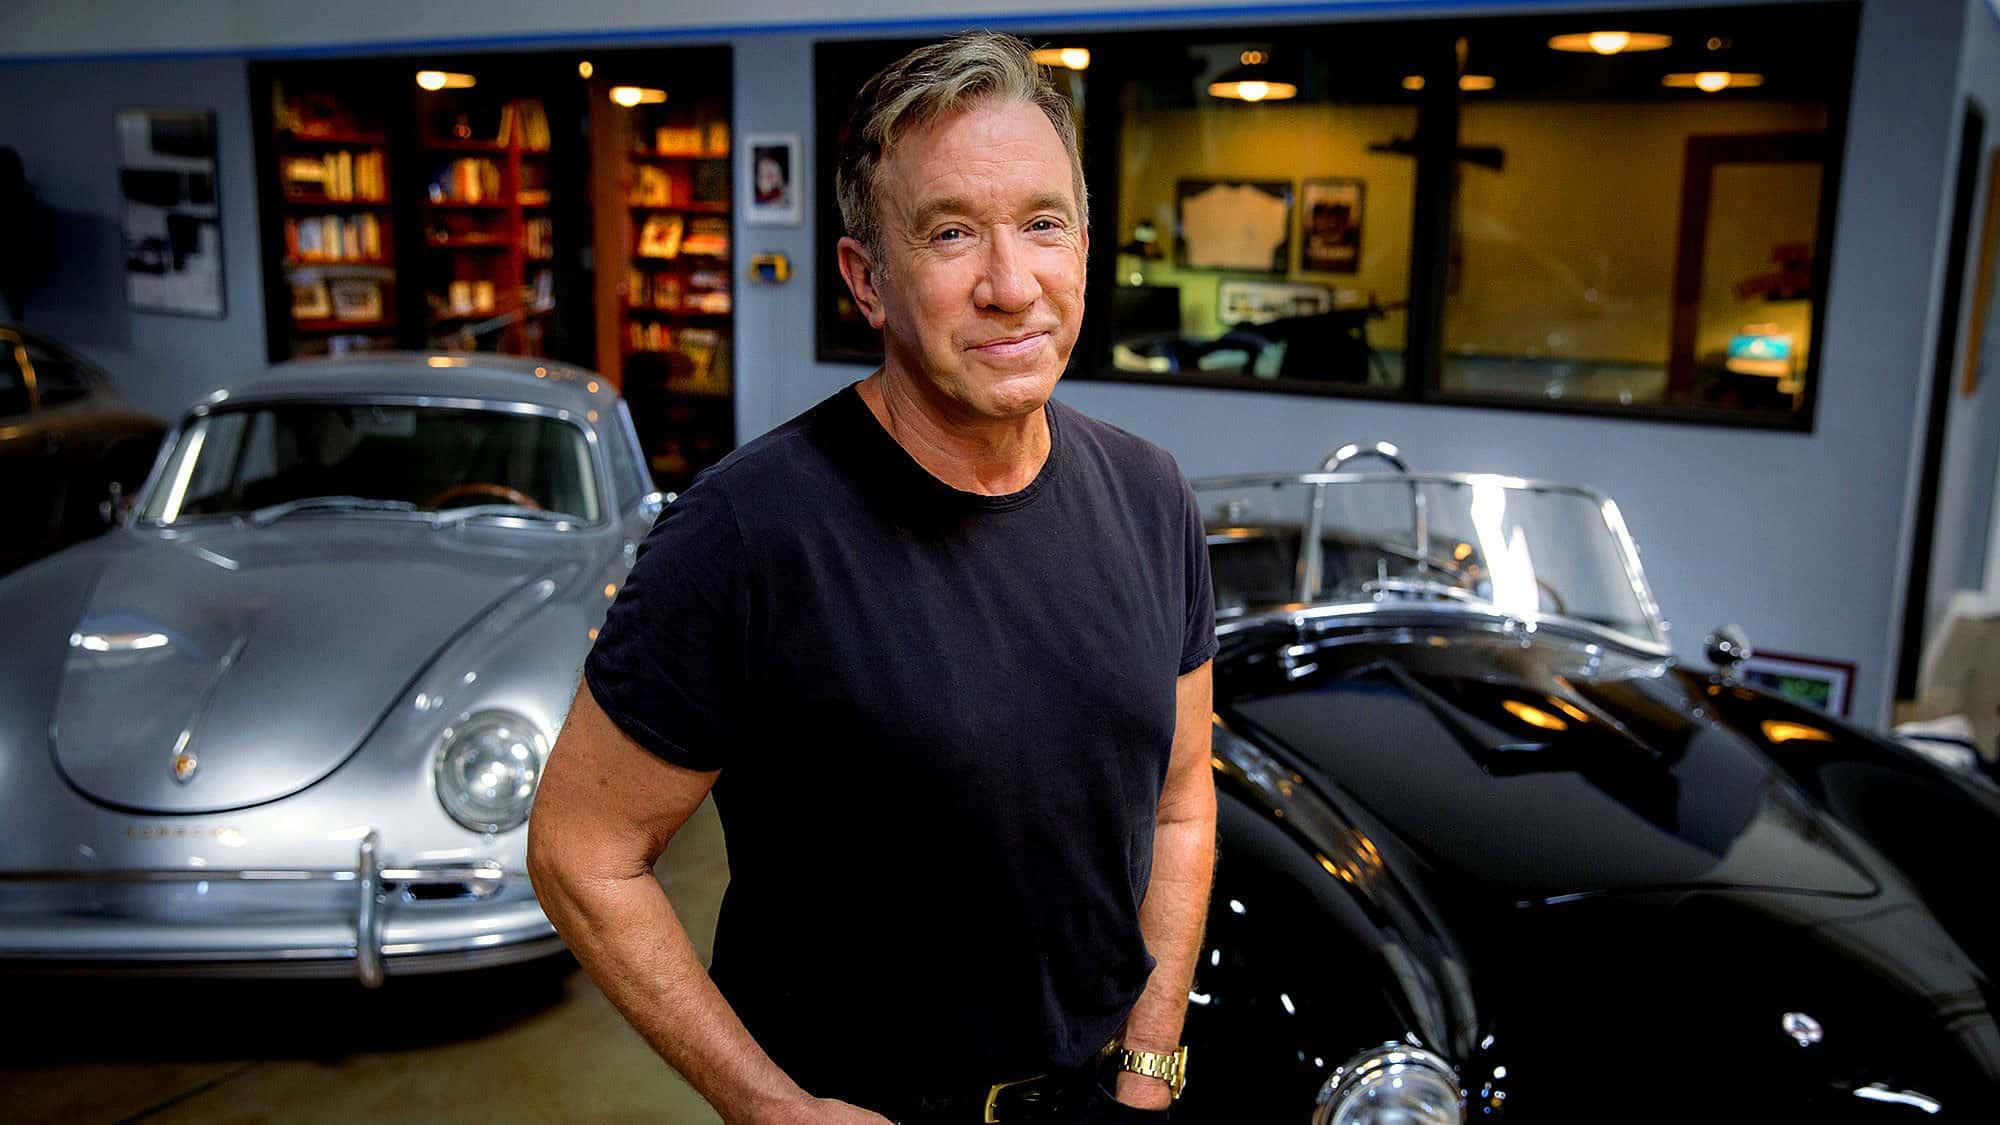 Тим Алън и колите в гаража му.